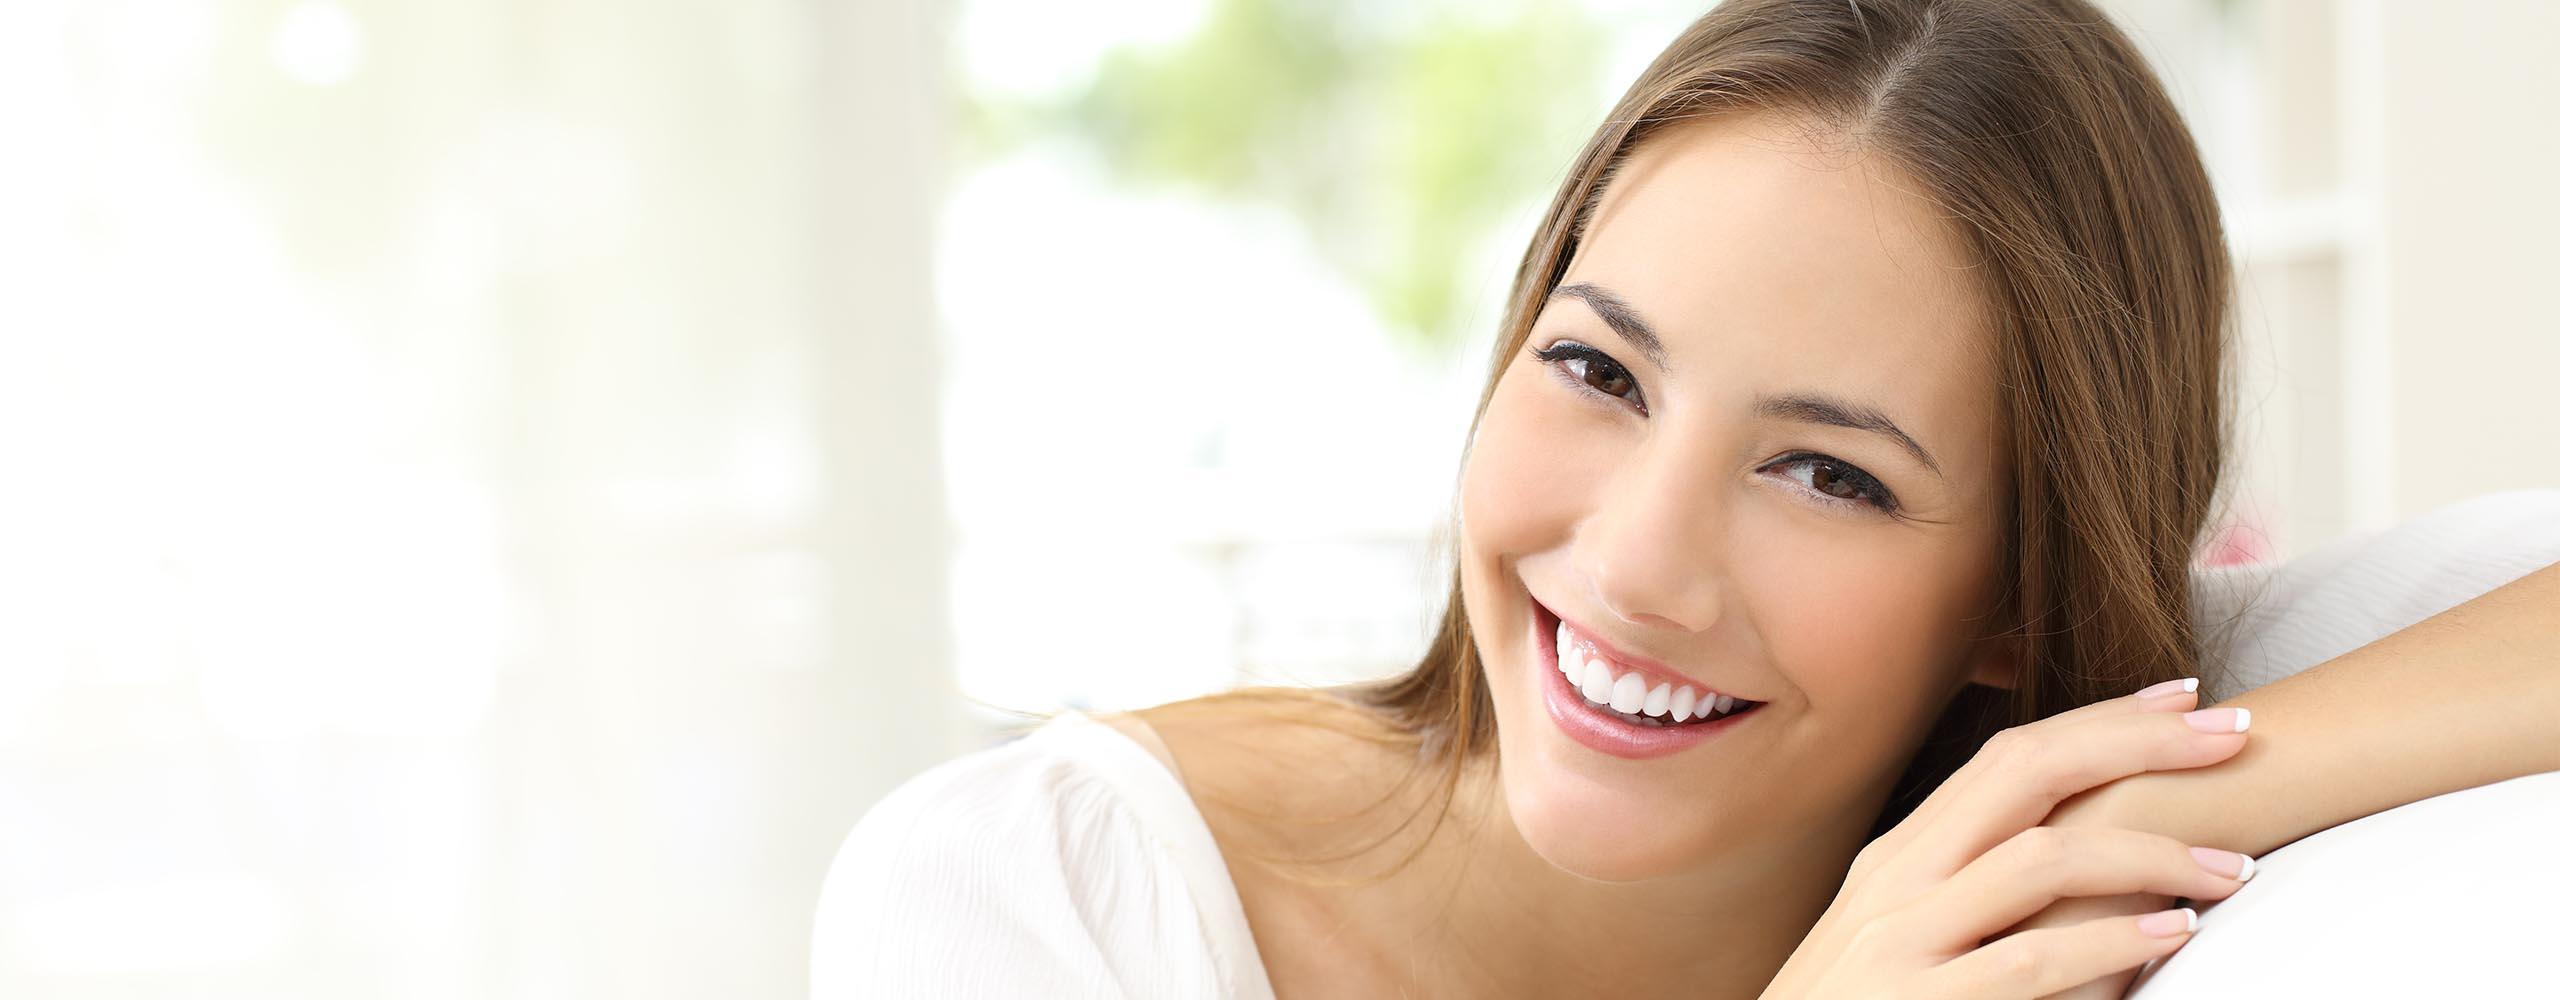 The Divine Pro Skin Transformation Technology